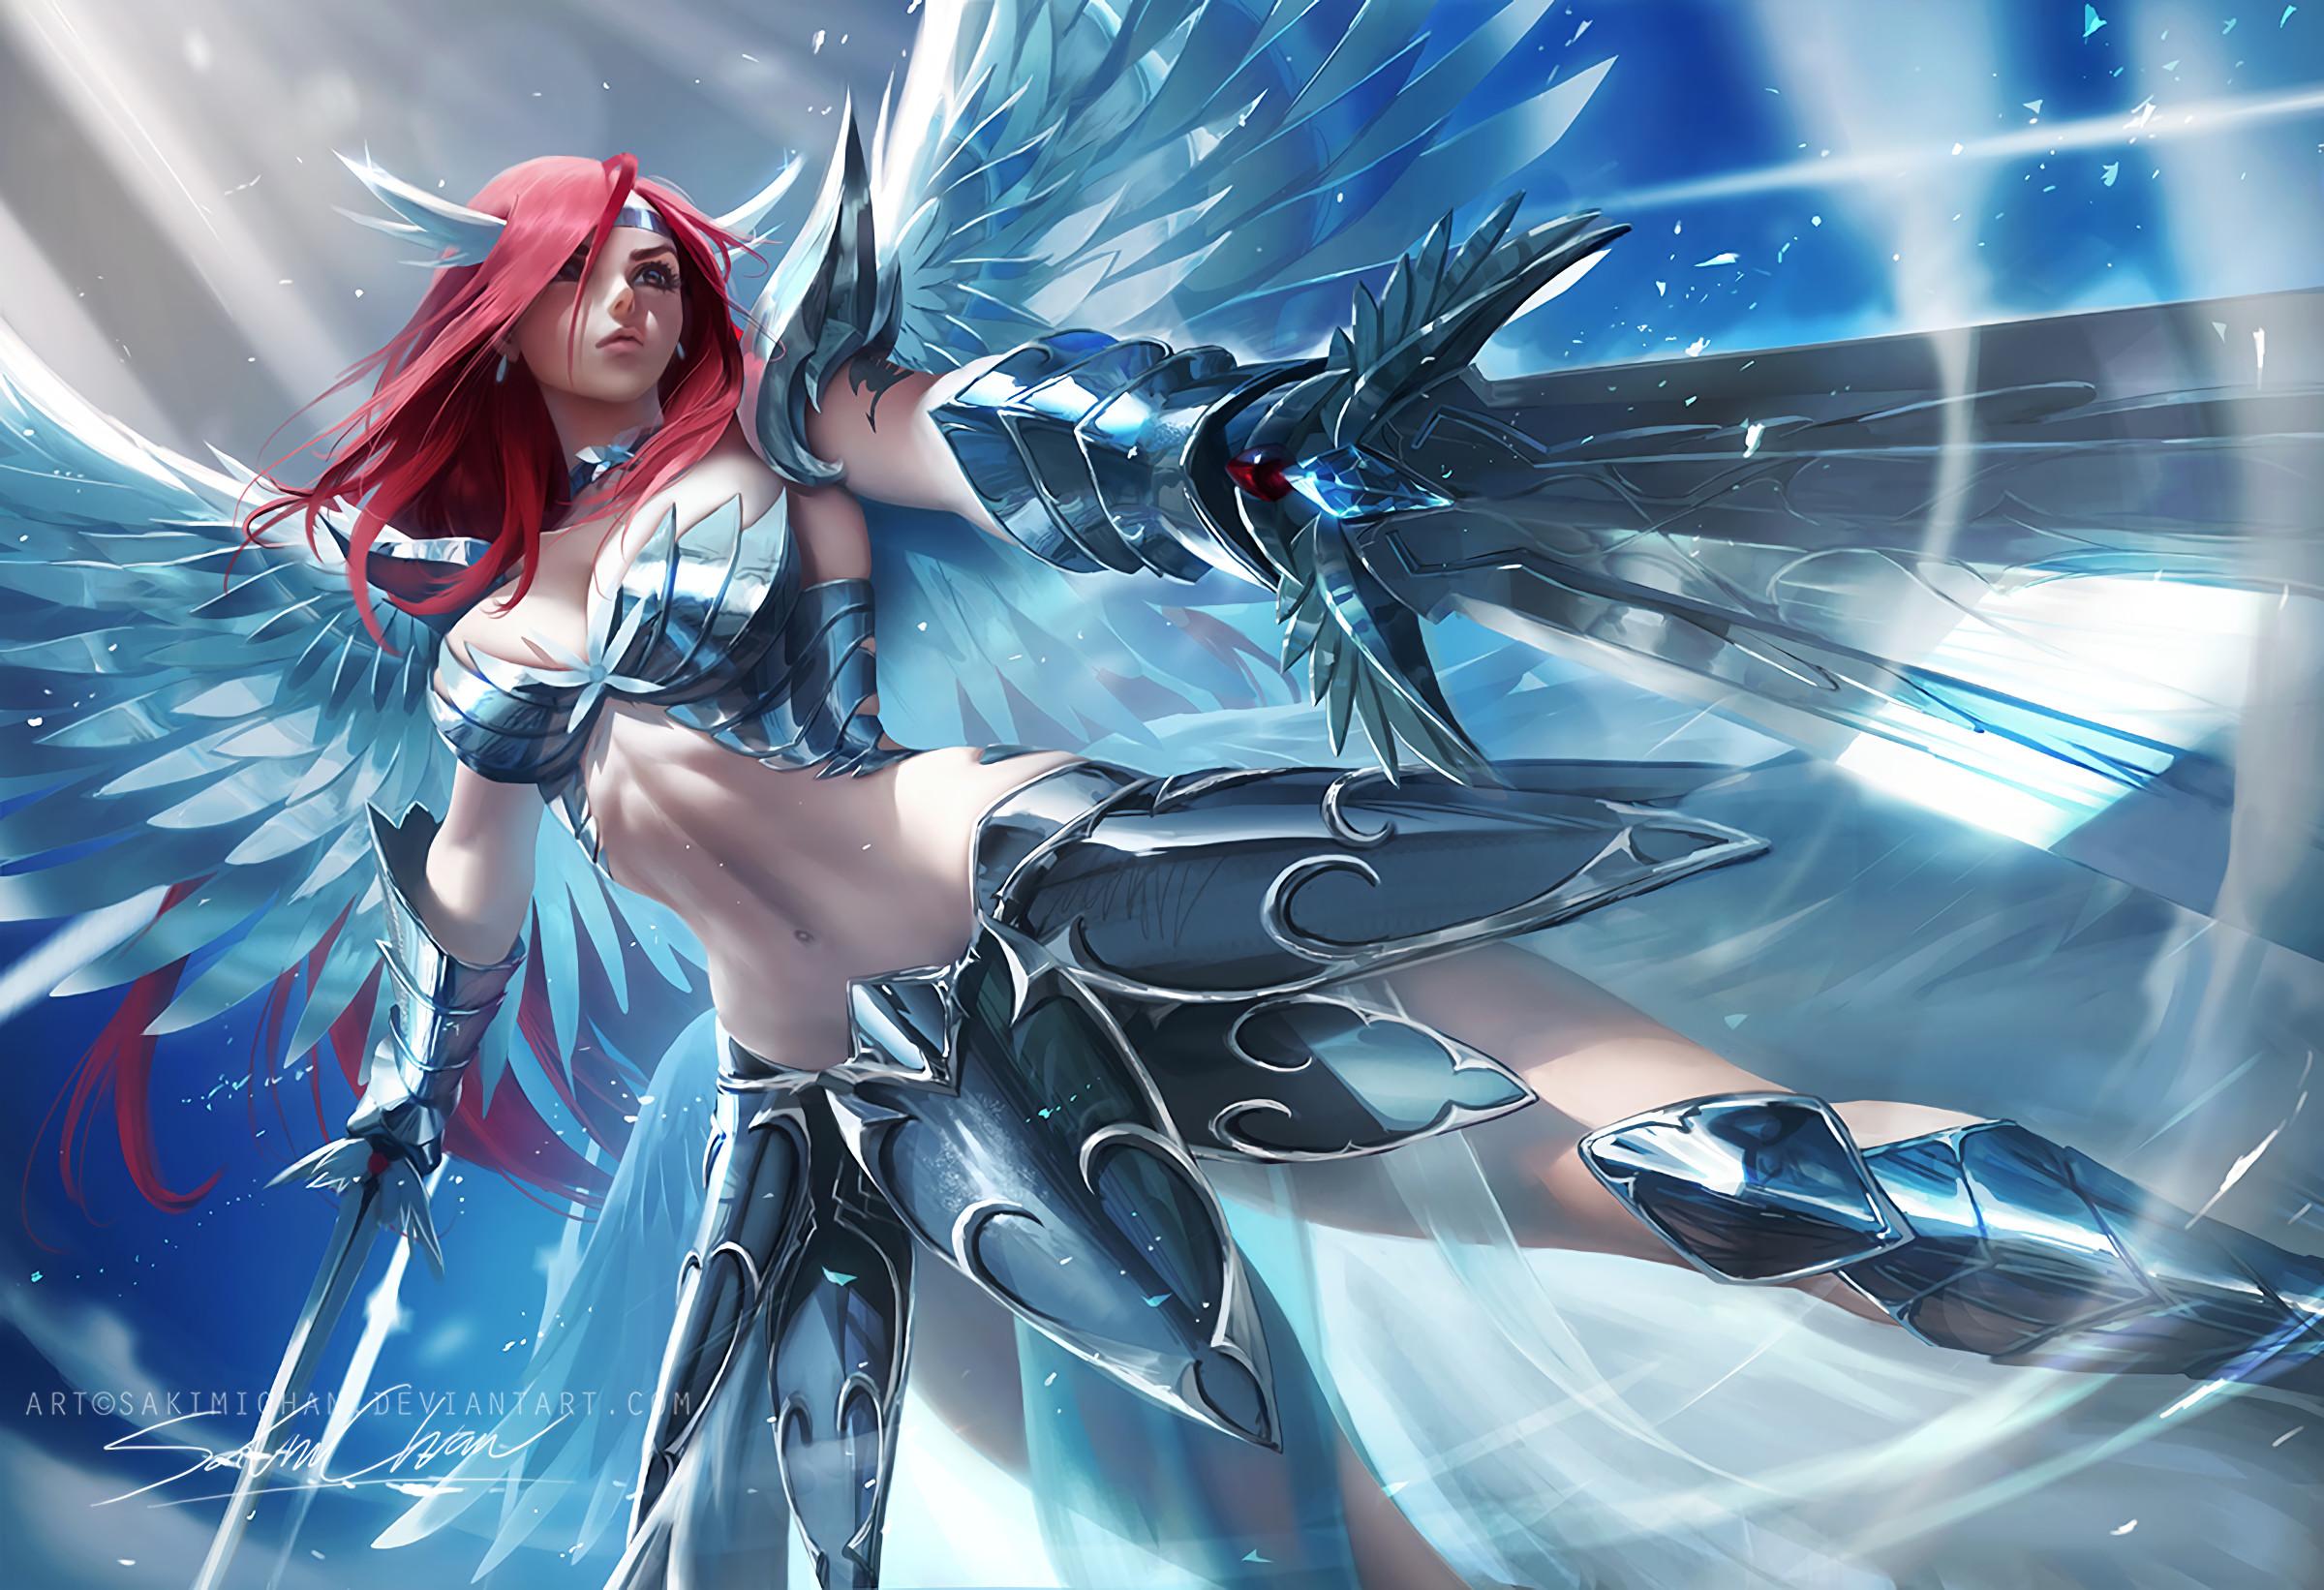 Anime – Fairy Tail Erza Scarlet Wallpaper